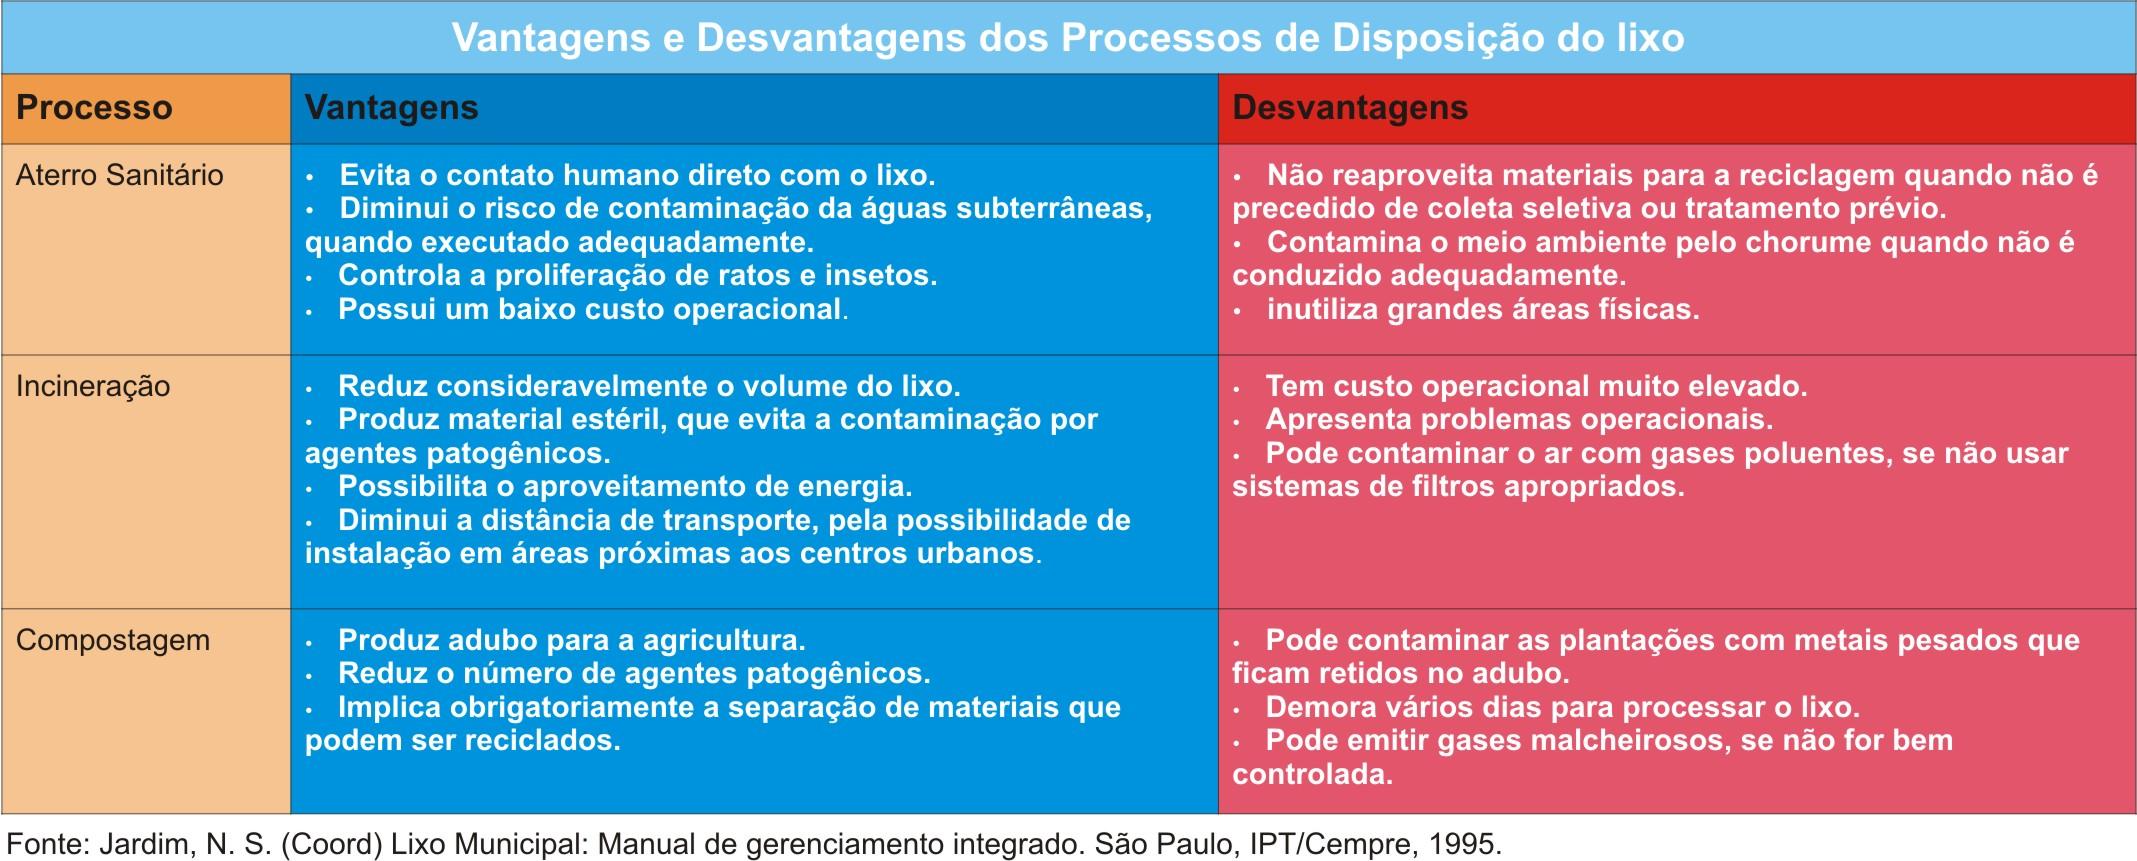 http://portaldoprofessor.mec.gov.br/storage/discovirtual/aulas/1831/imagens/Aula_01_Marc09_02.jpg